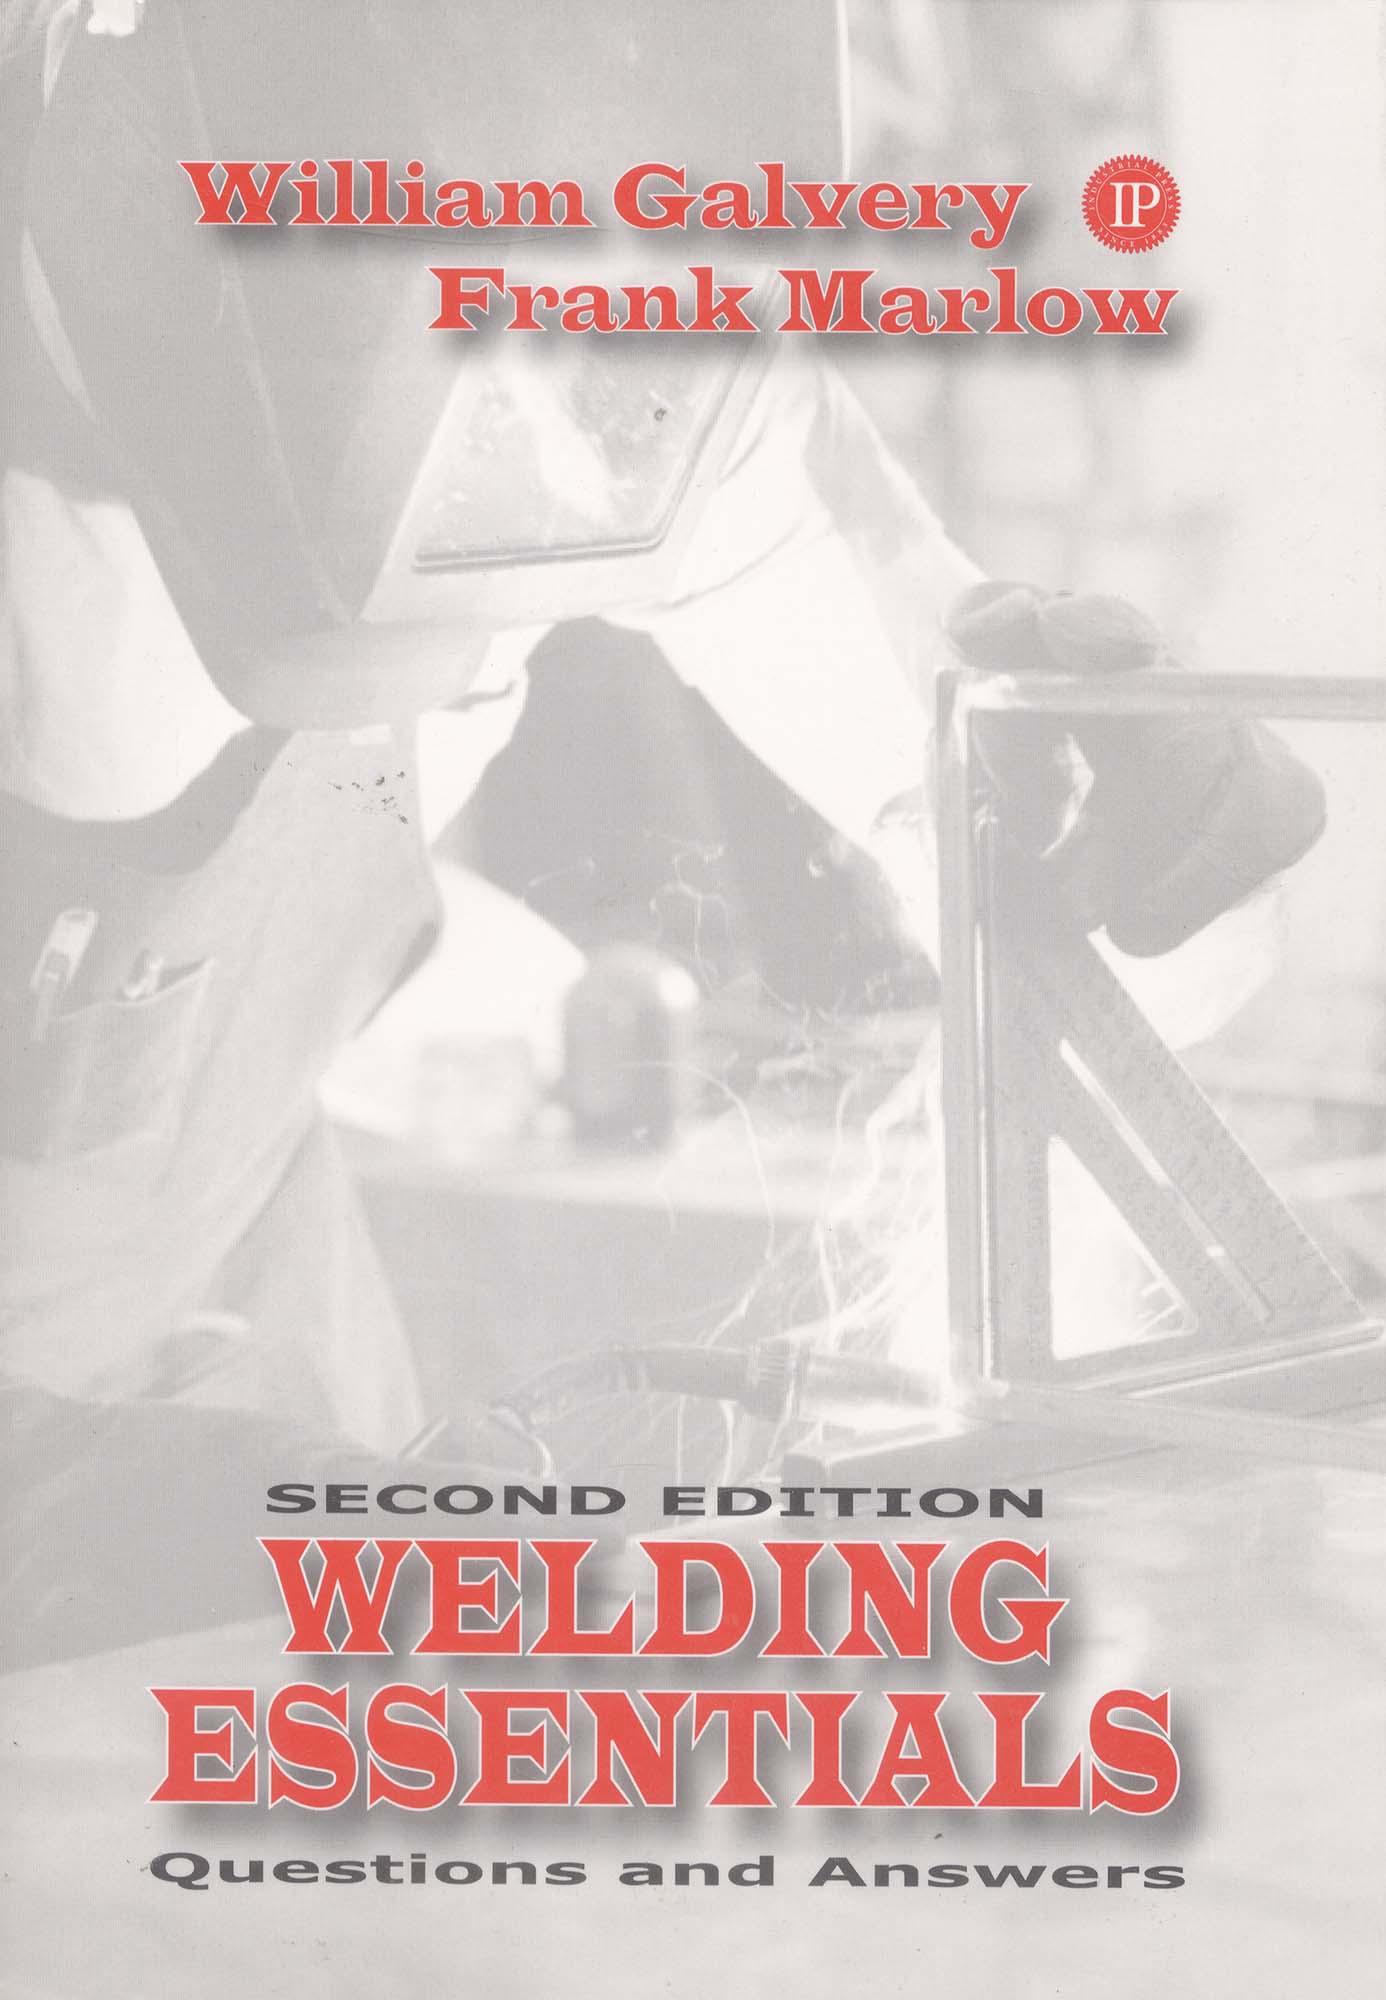 Book-Welding Essentials, Q and A